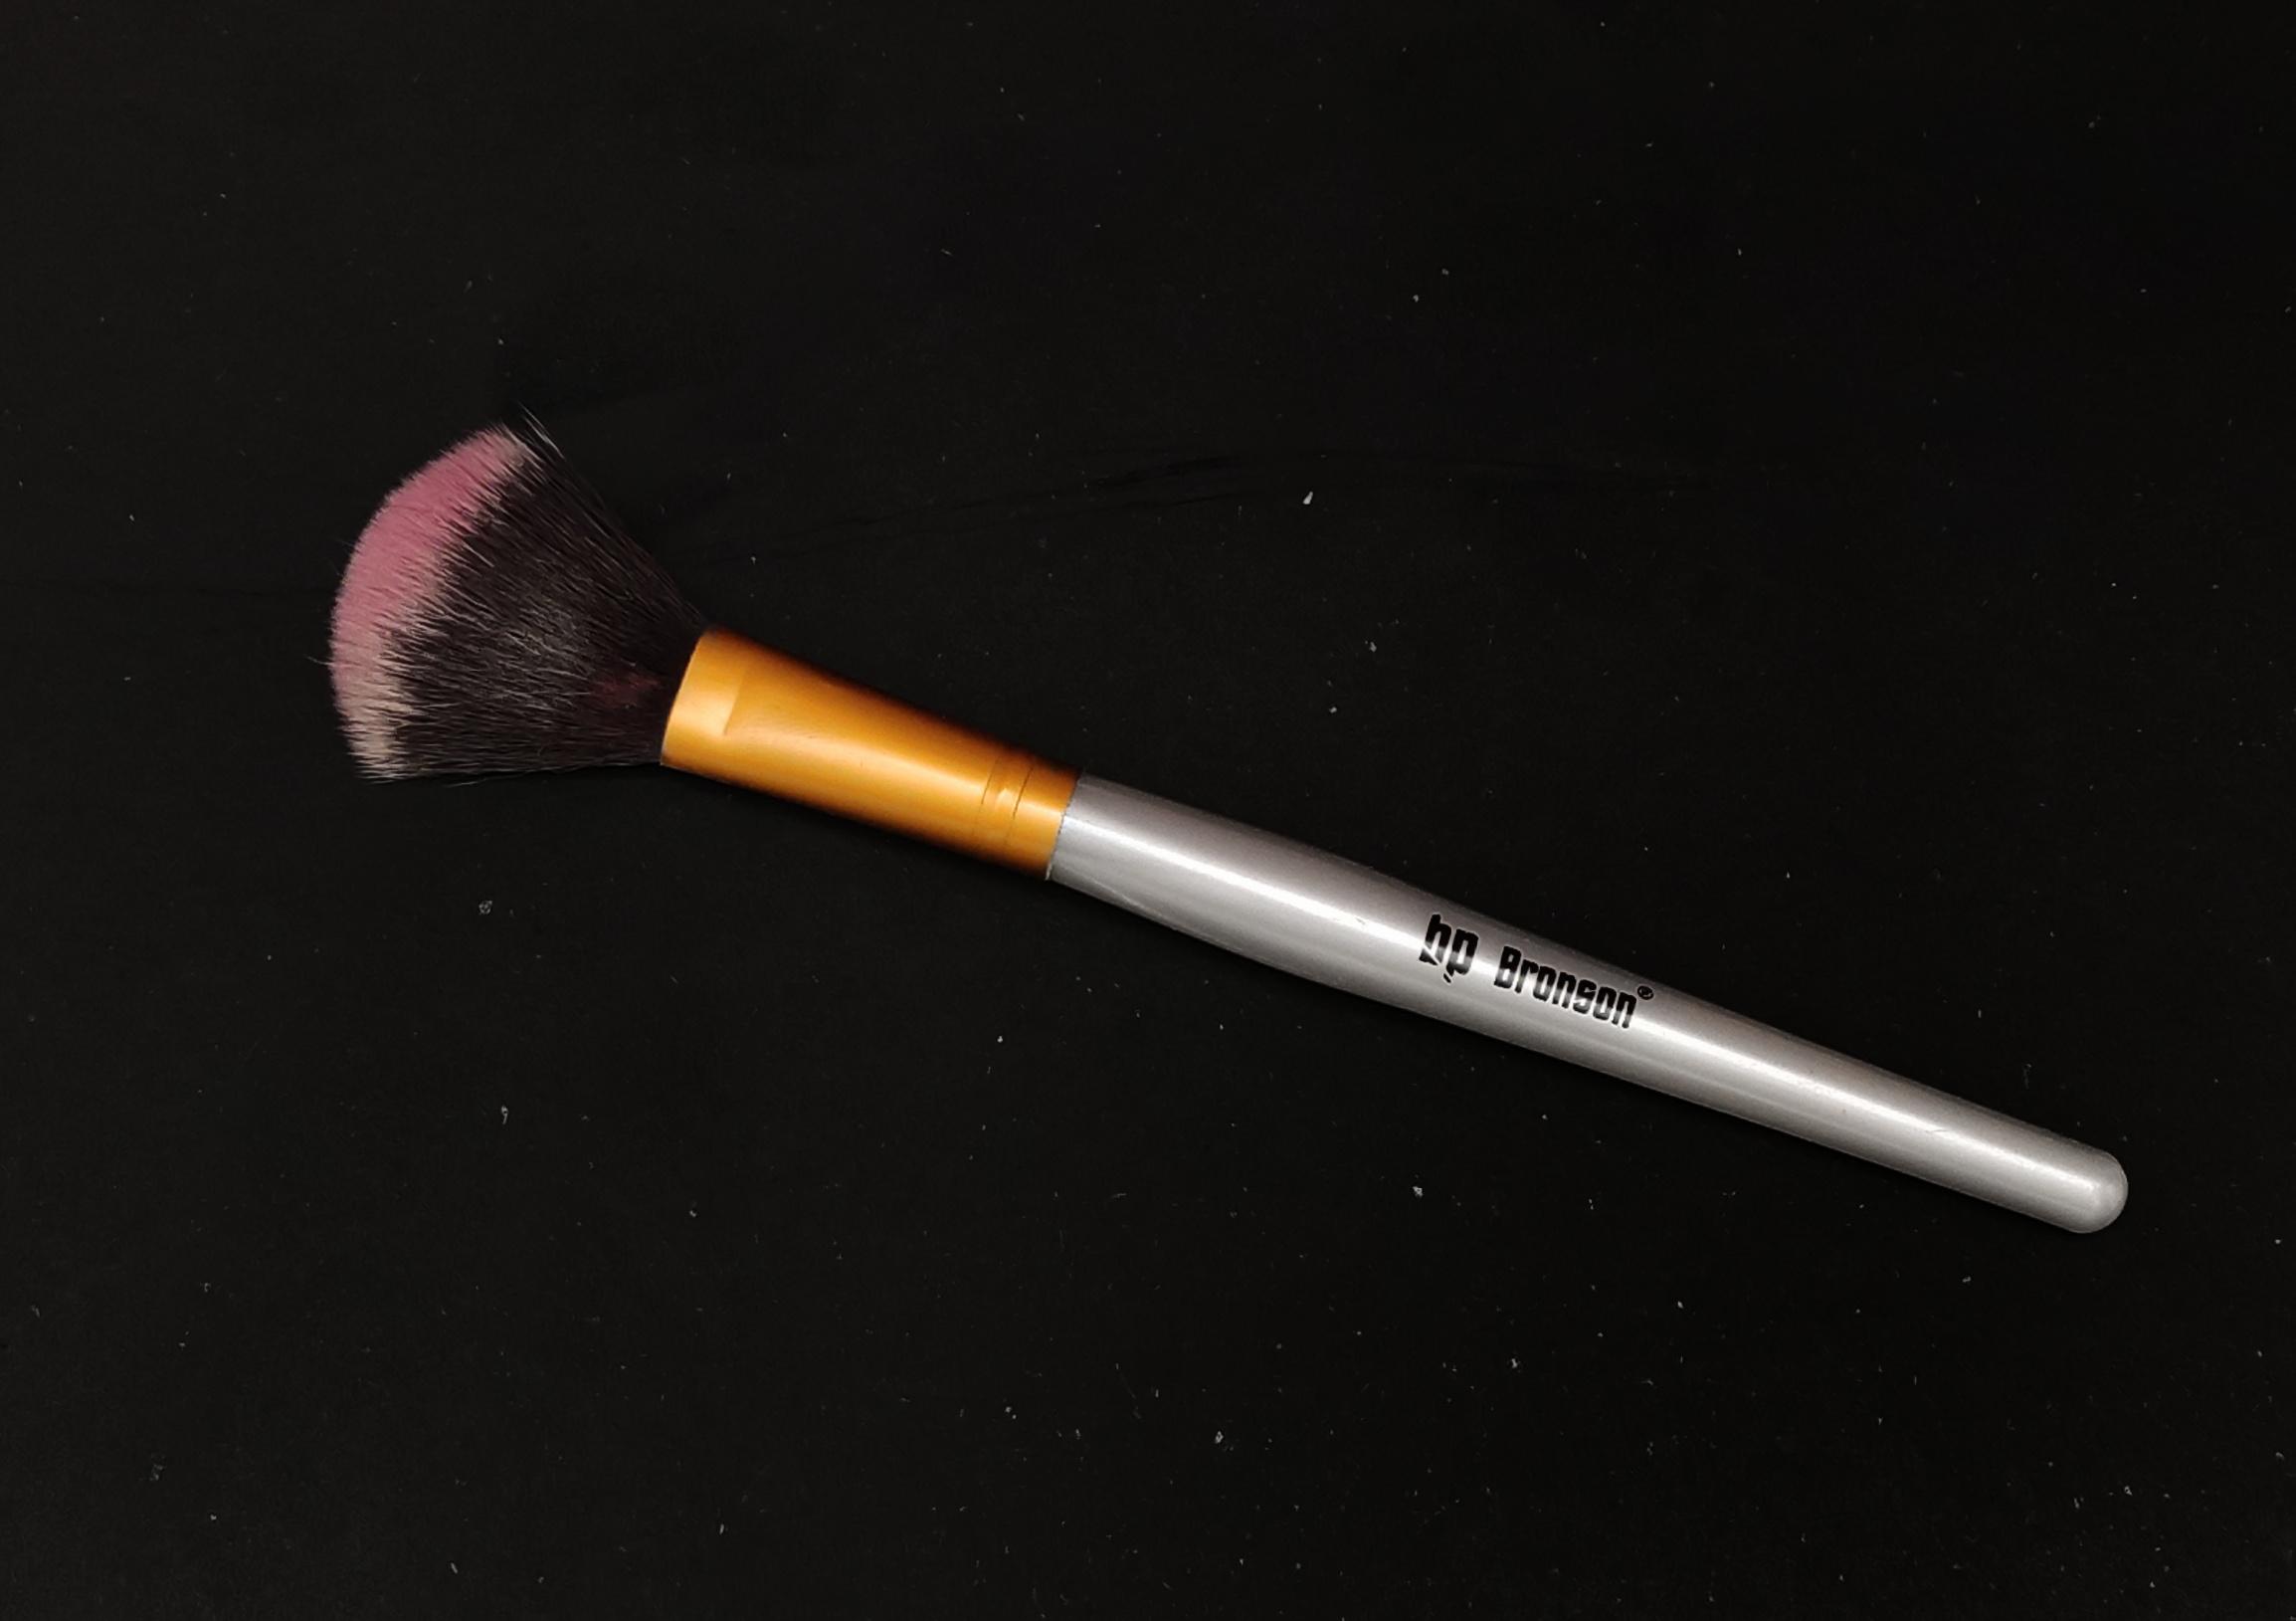 Makeup brush on black ground.